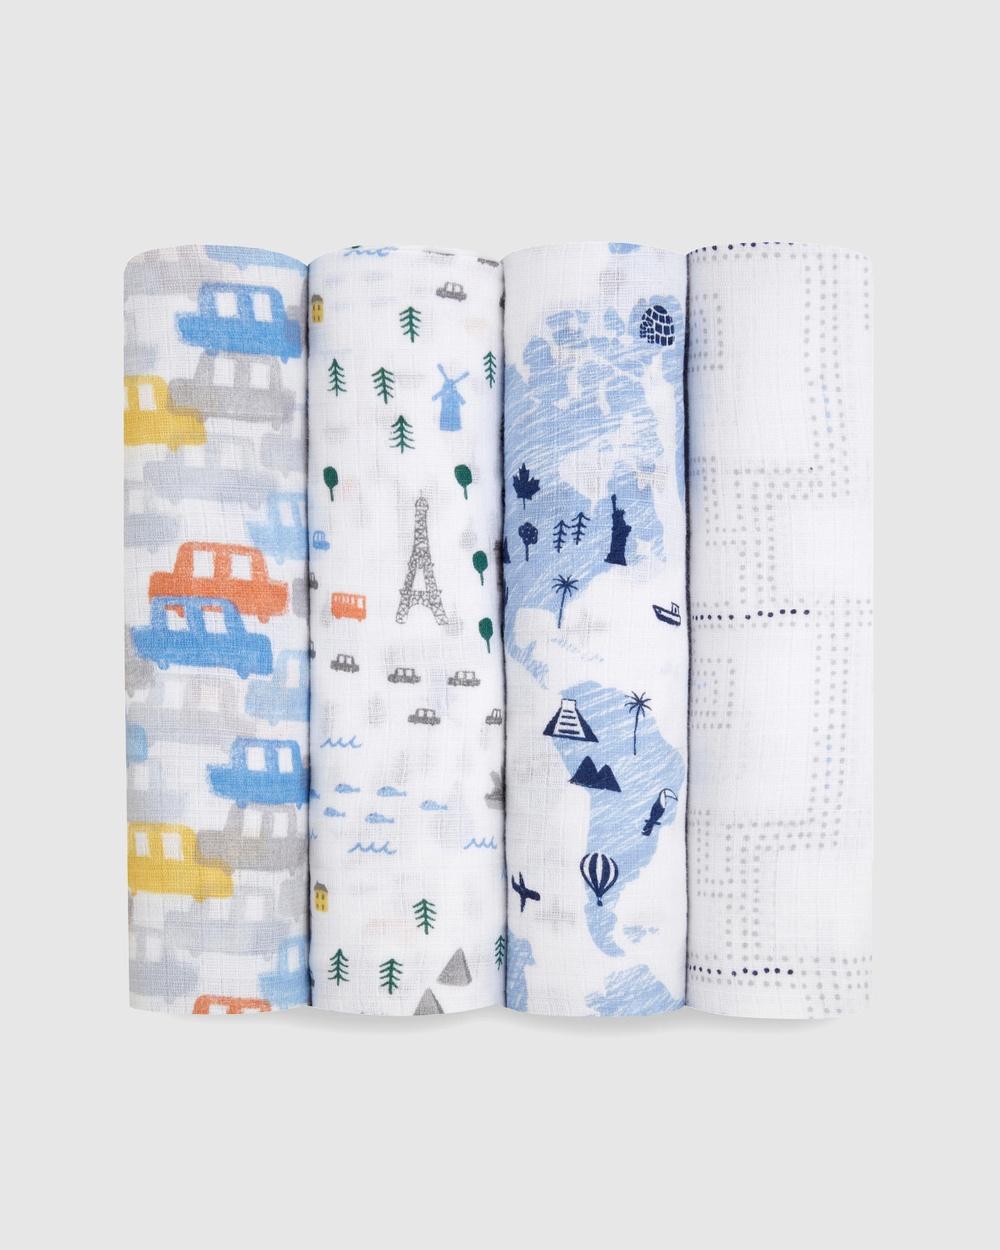 Aden & Anais Essentials 4 Pack Swaddles Wraps Blankets Little Big World 4-Pack